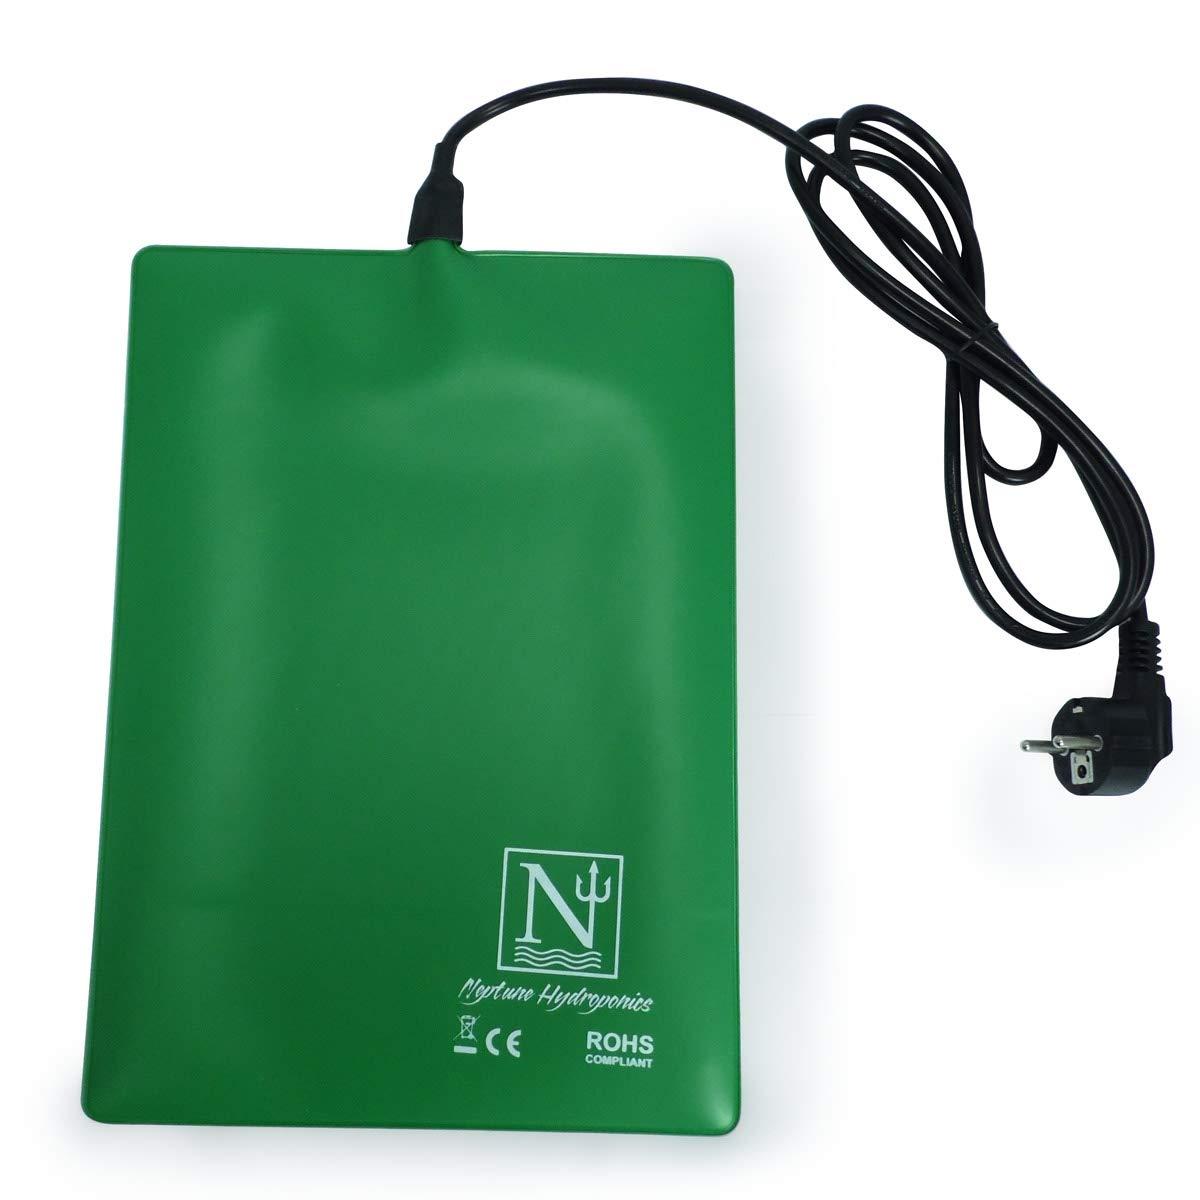 NEPTUNE Hydroponics Tapis chauffant 17W